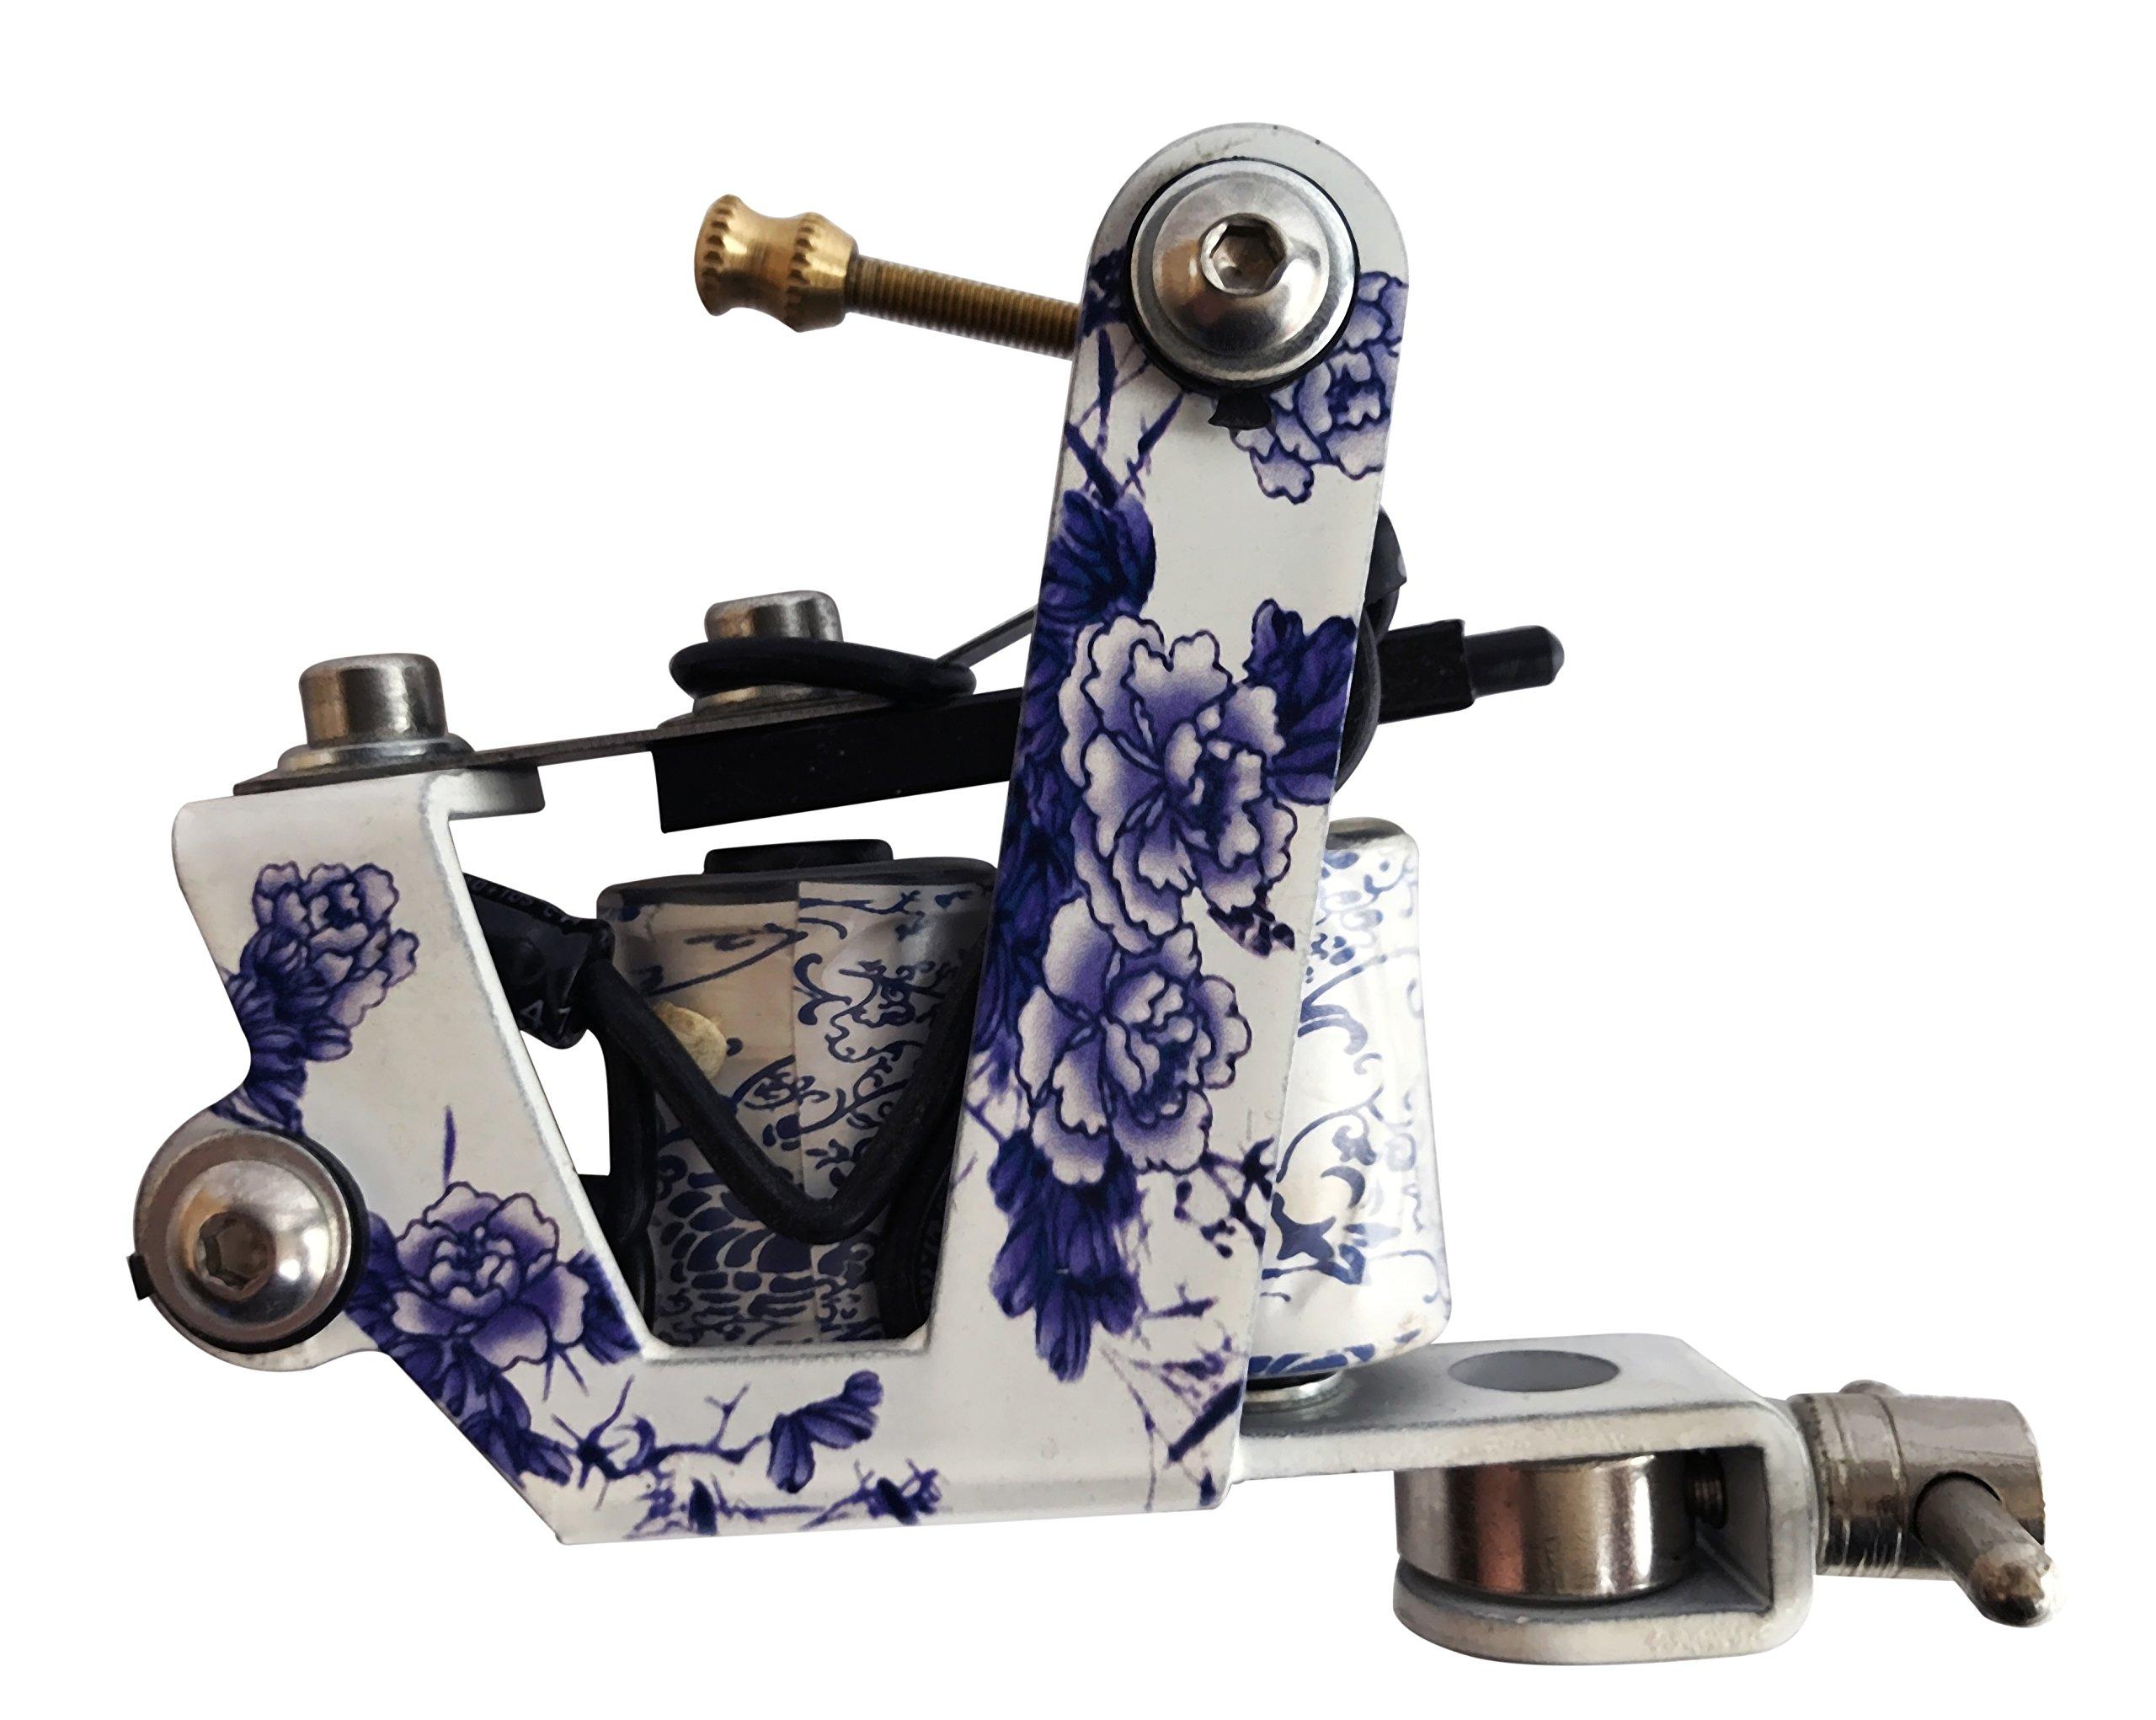 1TattooWorld (2) x Professional Cast Iron 10 Wrap Aluminum Coils Tattoo Machine Liner & Shader, White & Blue, OTW-M105-6